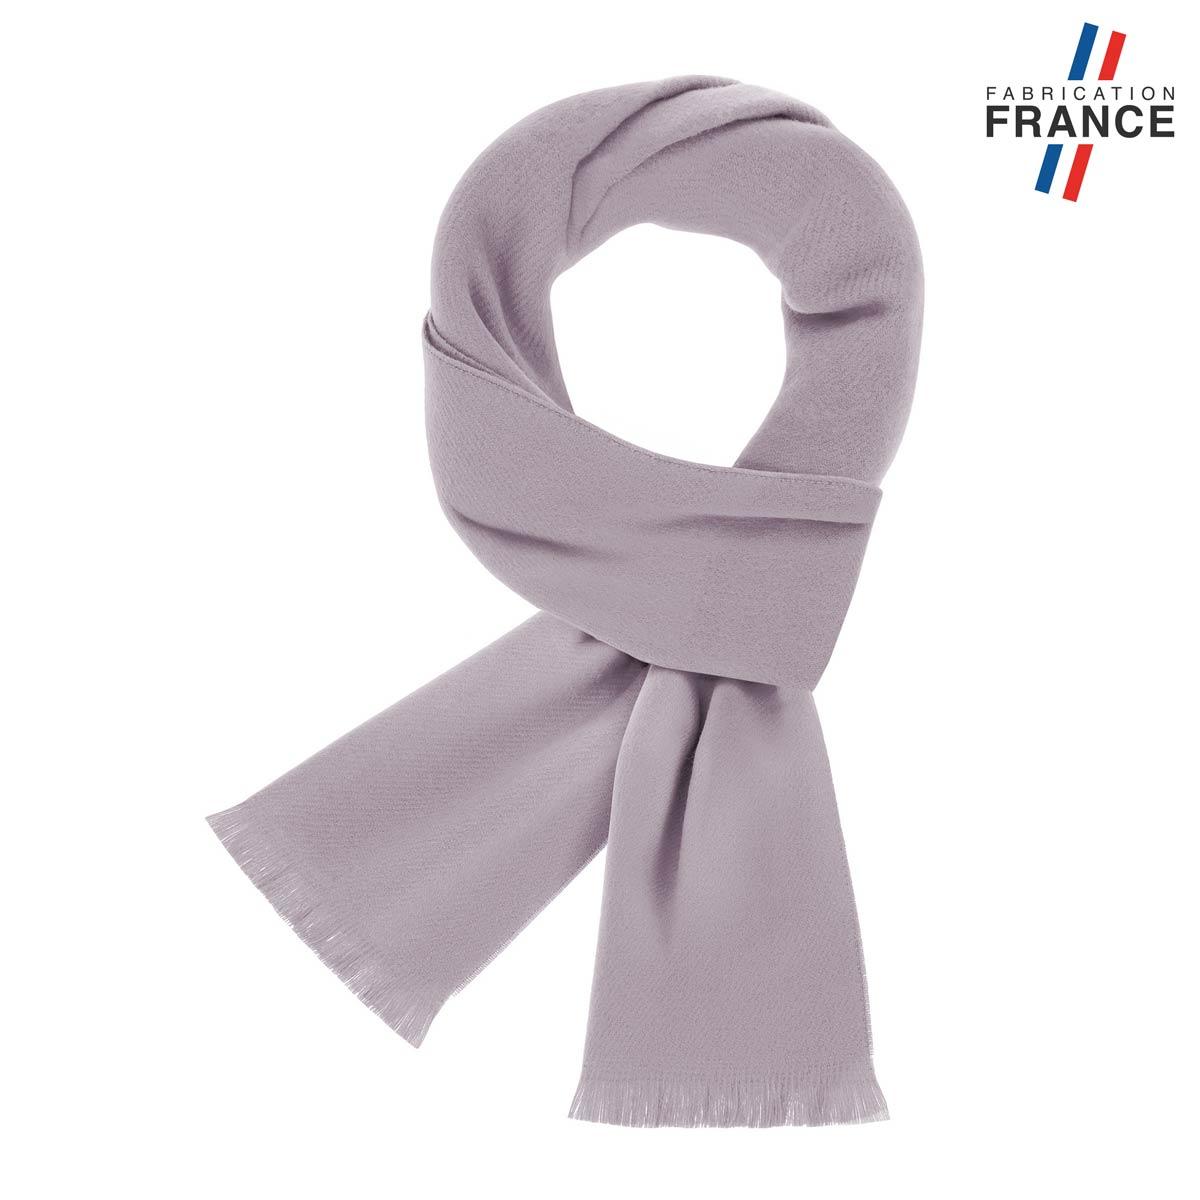 AT-06557_F12-1FR_Echarpe-parme-unie-femme-homme-franges-fabriquee-en-france